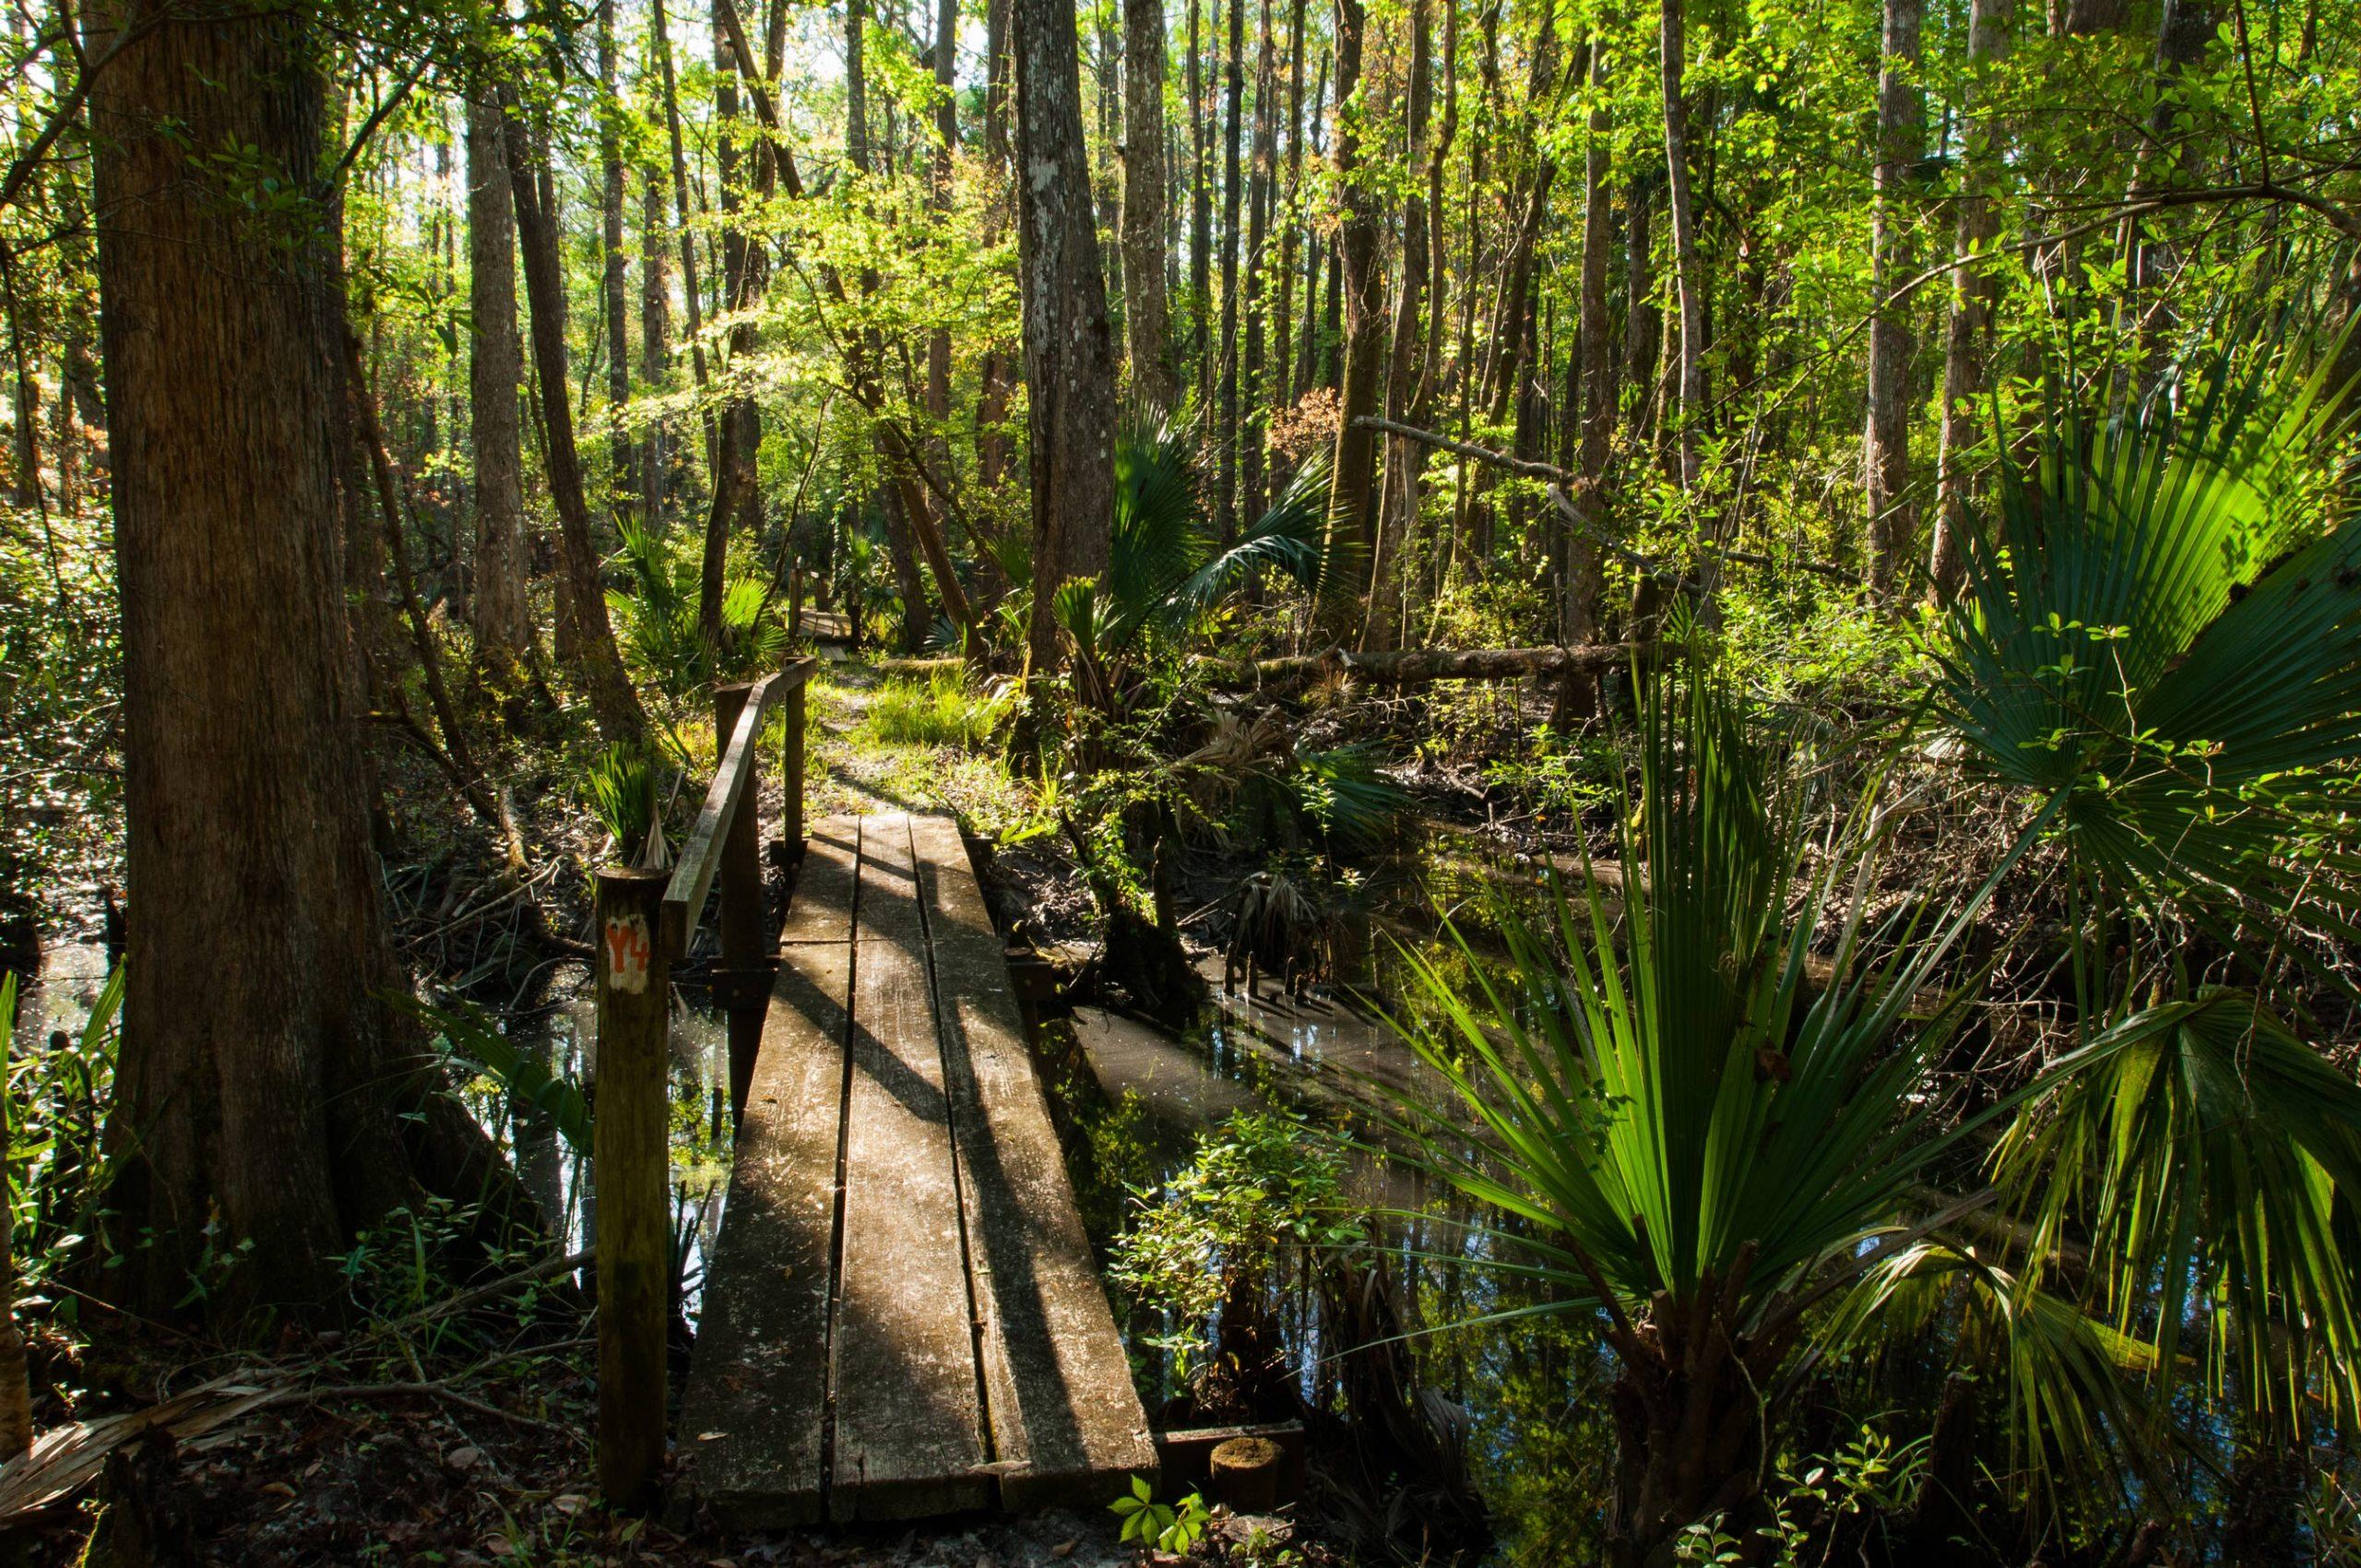 Wooden walking bridge over a stream